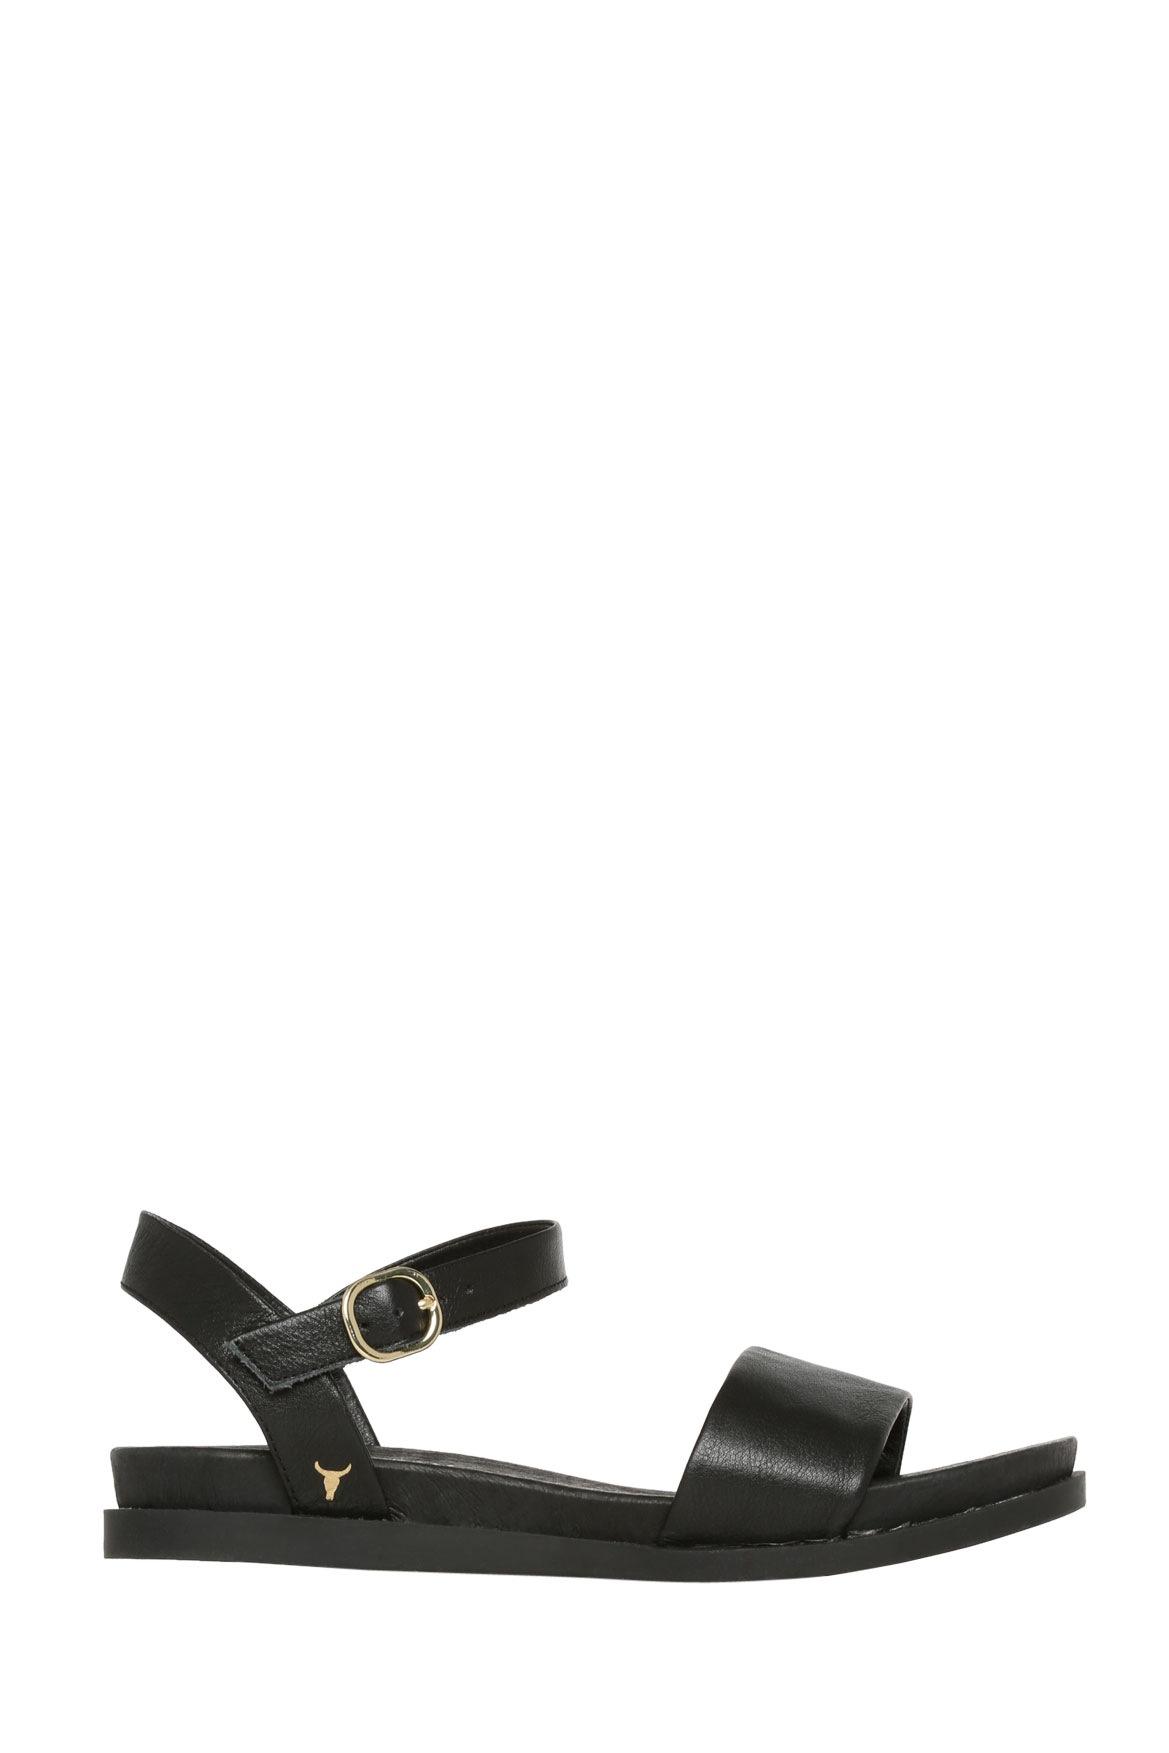 Black sandals myer - Details Black Classic Flat Sandal